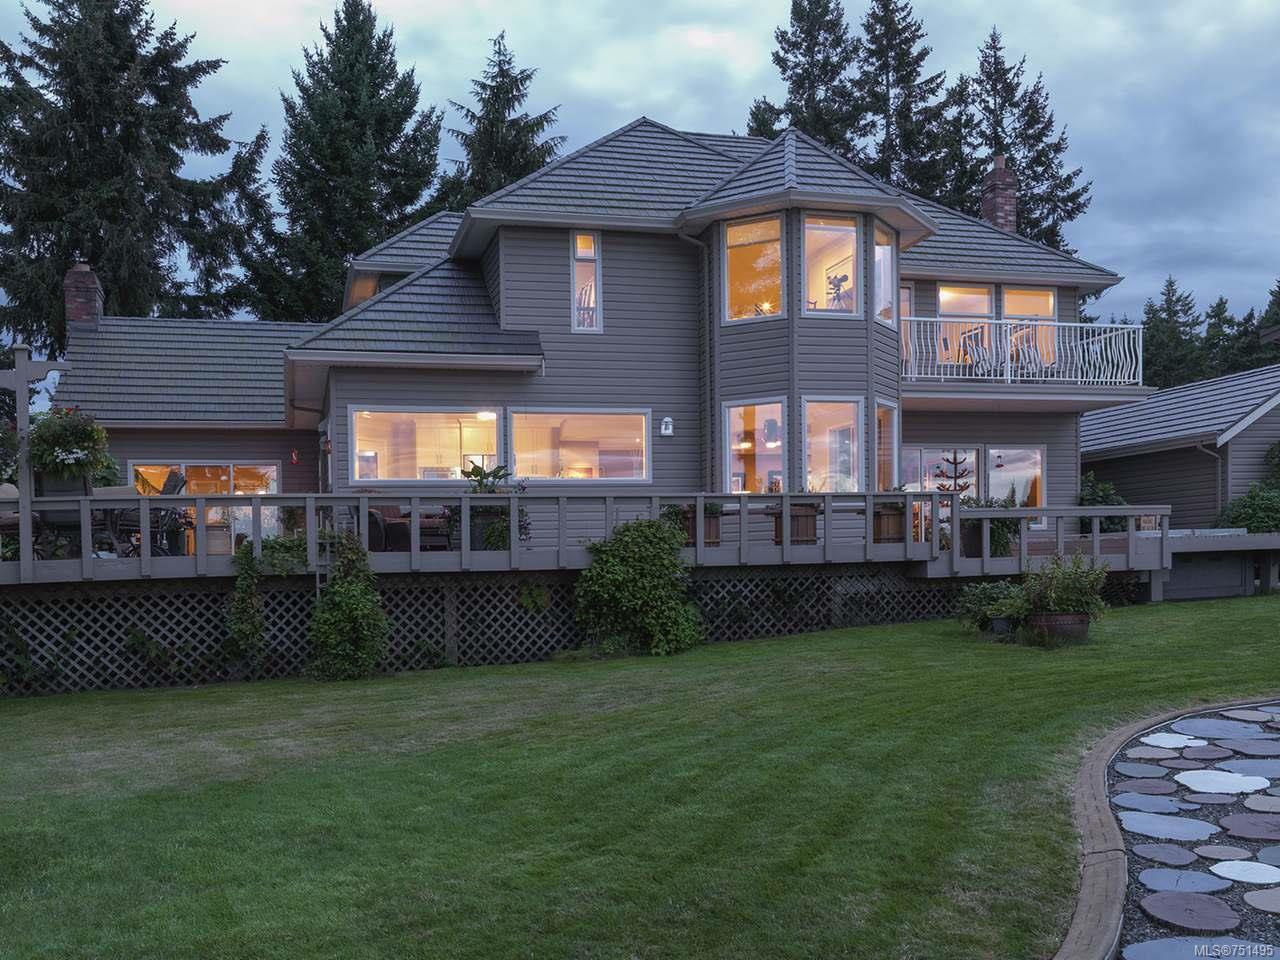 Main Photo: 8062 Harmony Cres in MERVILLE: CV Merville Black Creek House for sale (Comox Valley)  : MLS®# 751495